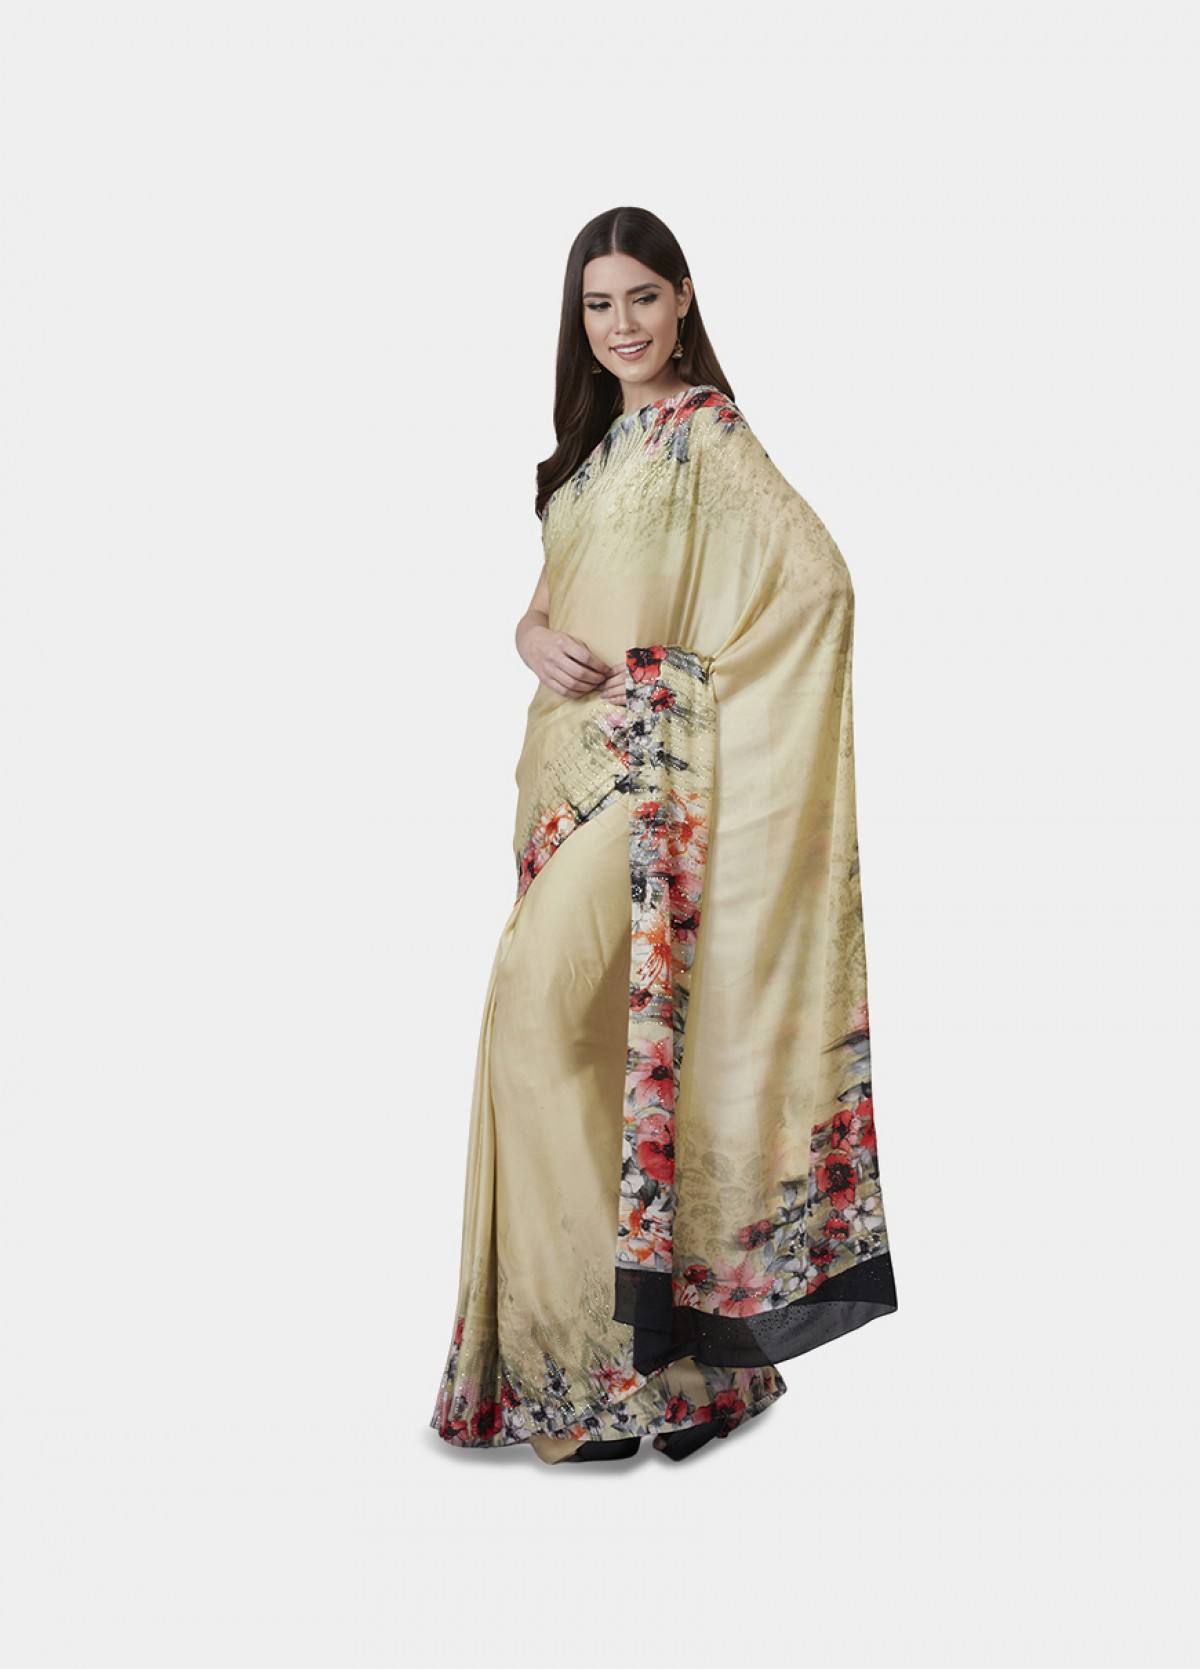 The Periwinkle Sari